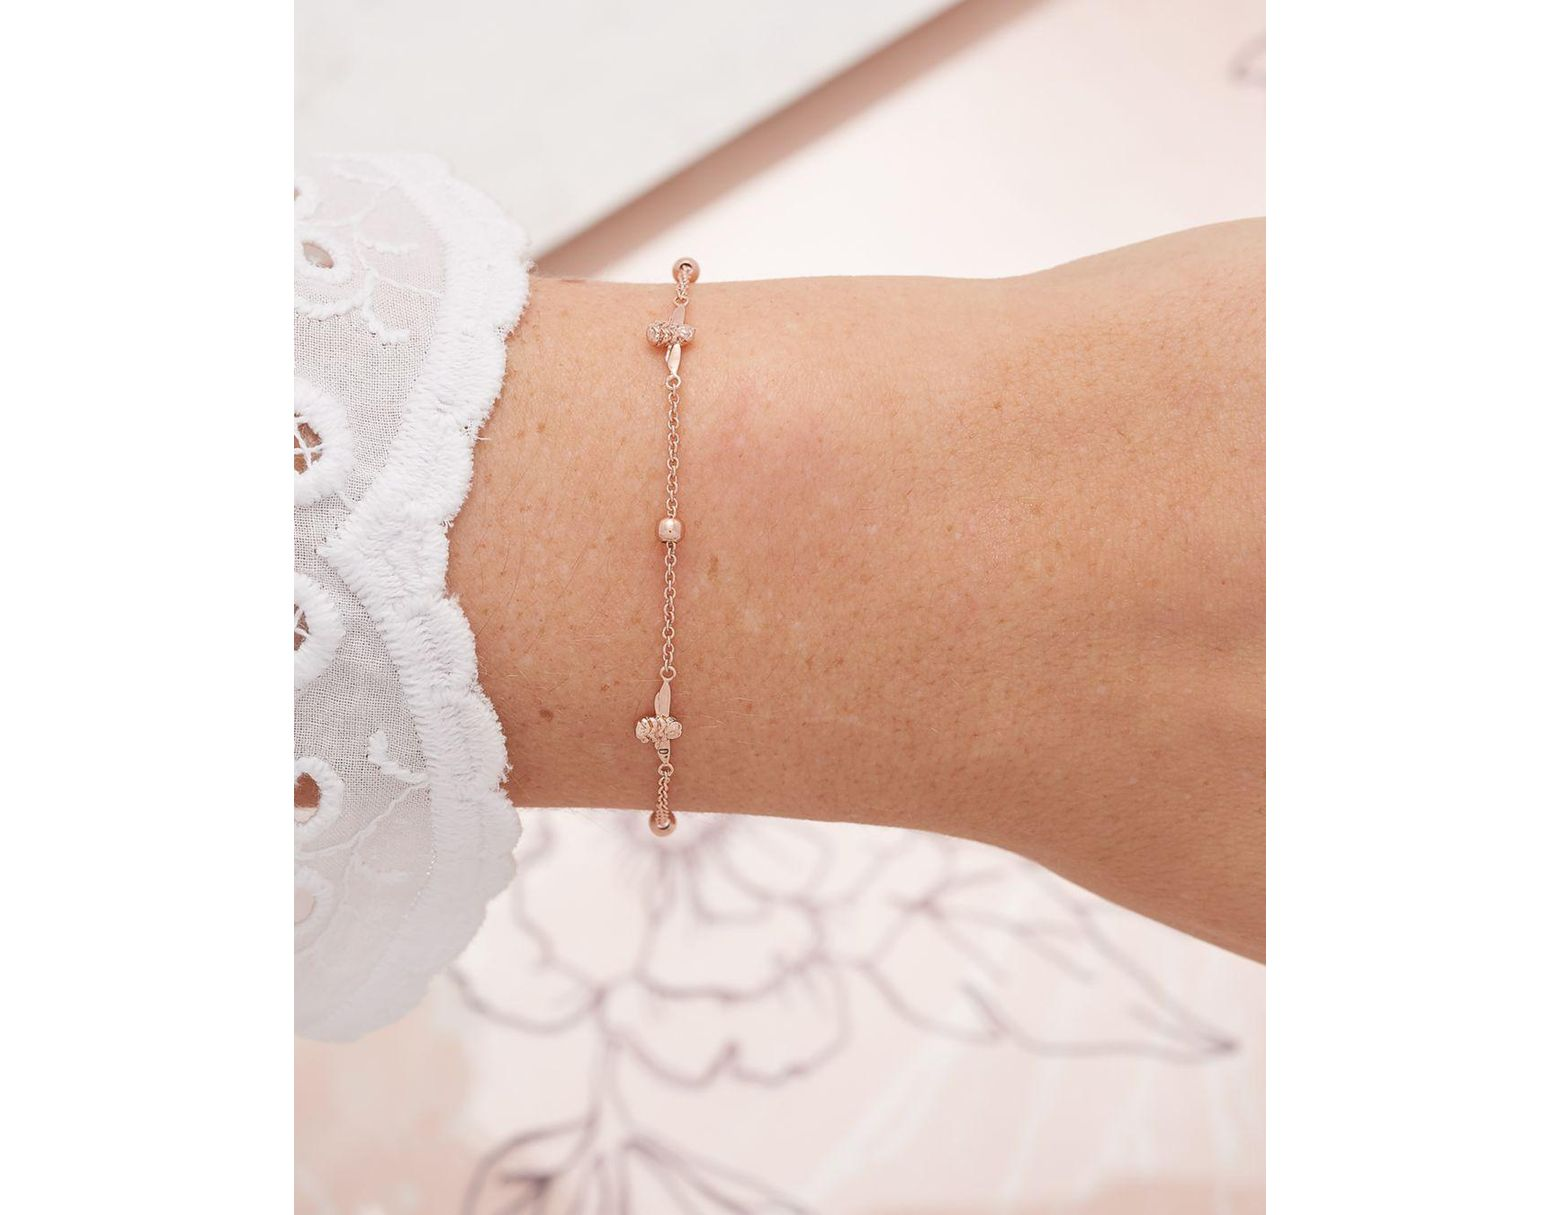 dcf76b3cd Olivia Burton 3d Bee And Ball Bracelet in Metallic - Save 52% - Lyst